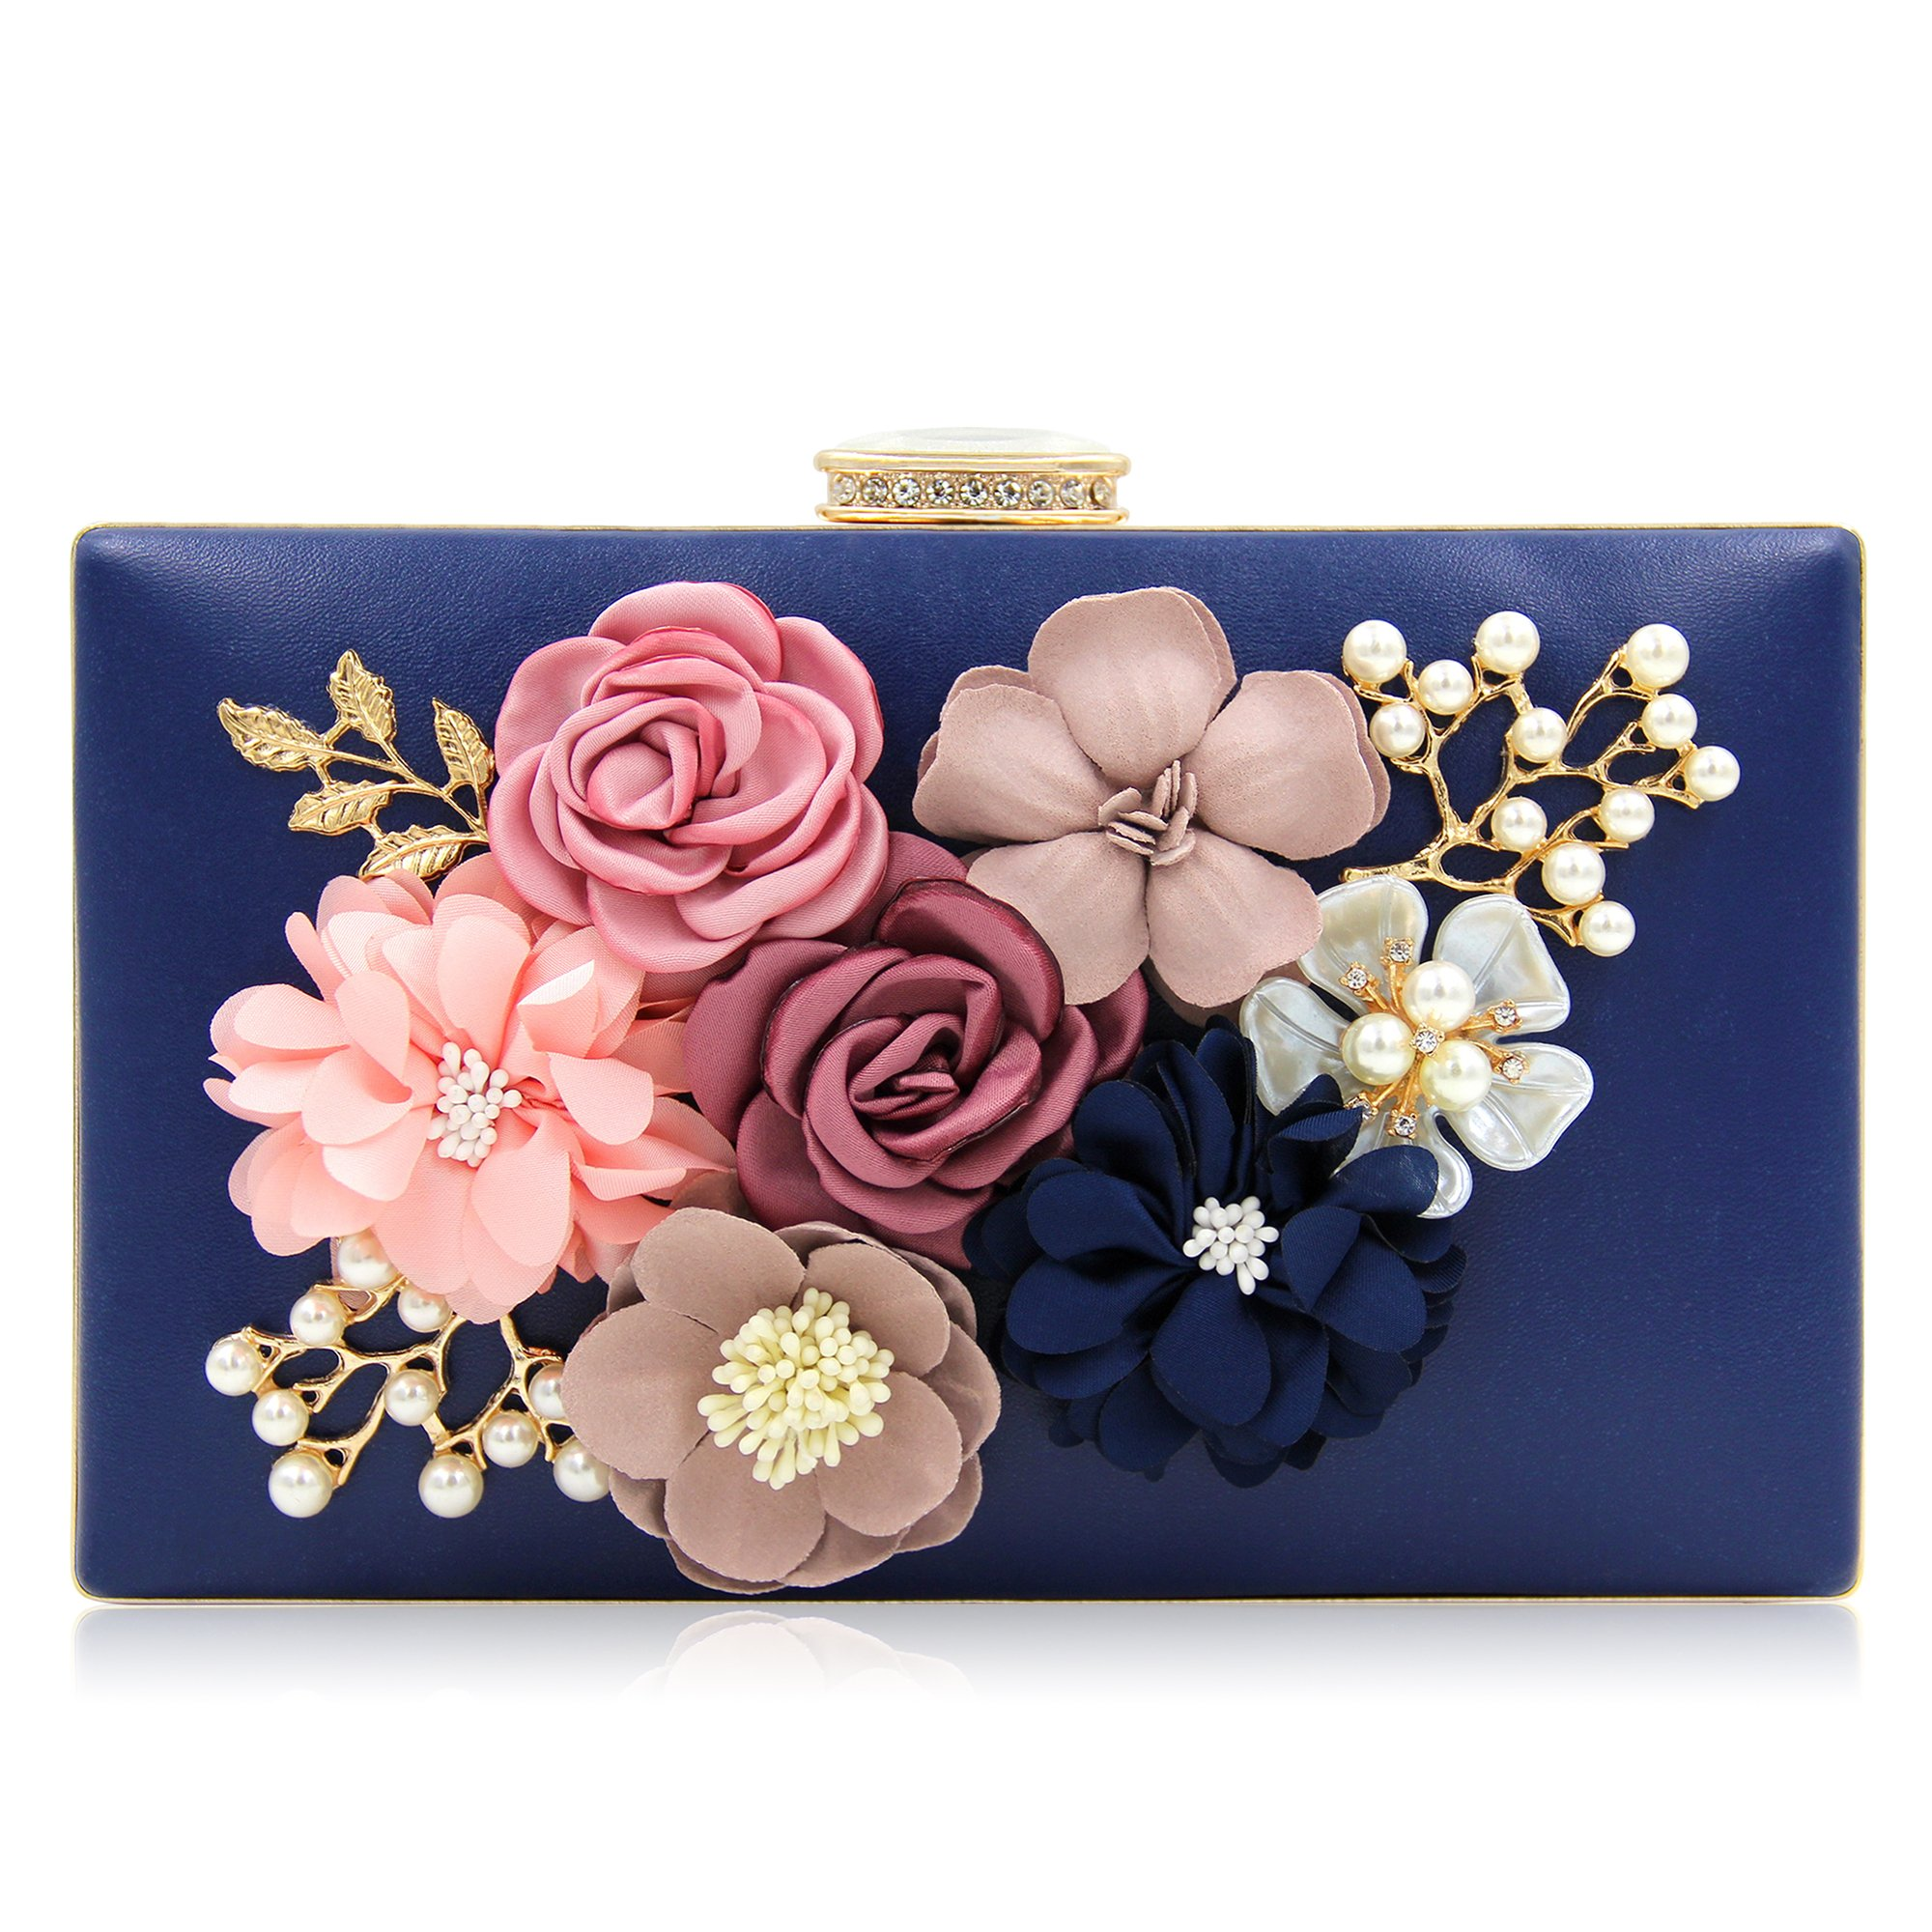 Milisente Women Flower Clutches Evening Bags Handbags Wedding Clutch Purse (Navy Blue)